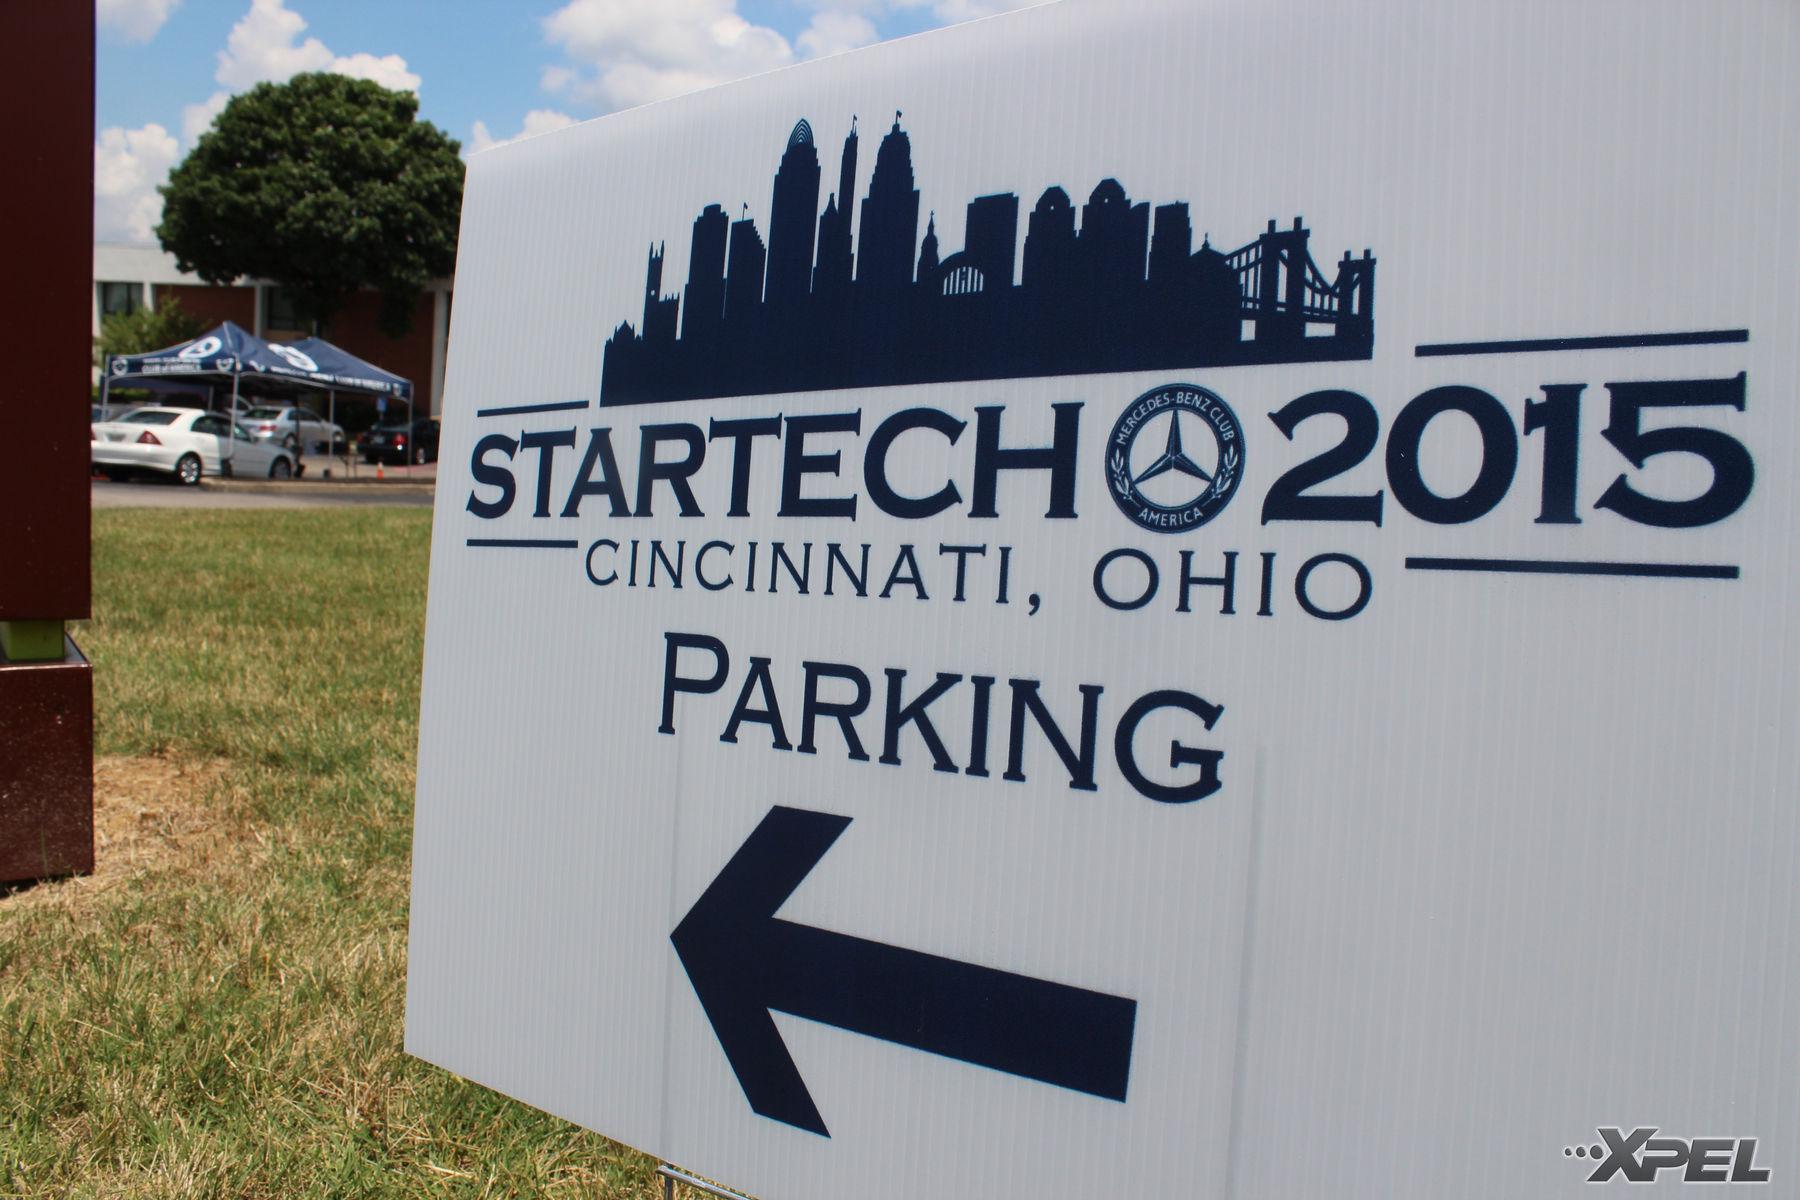 Mercedes-Benz  | Parking direction for StarTech